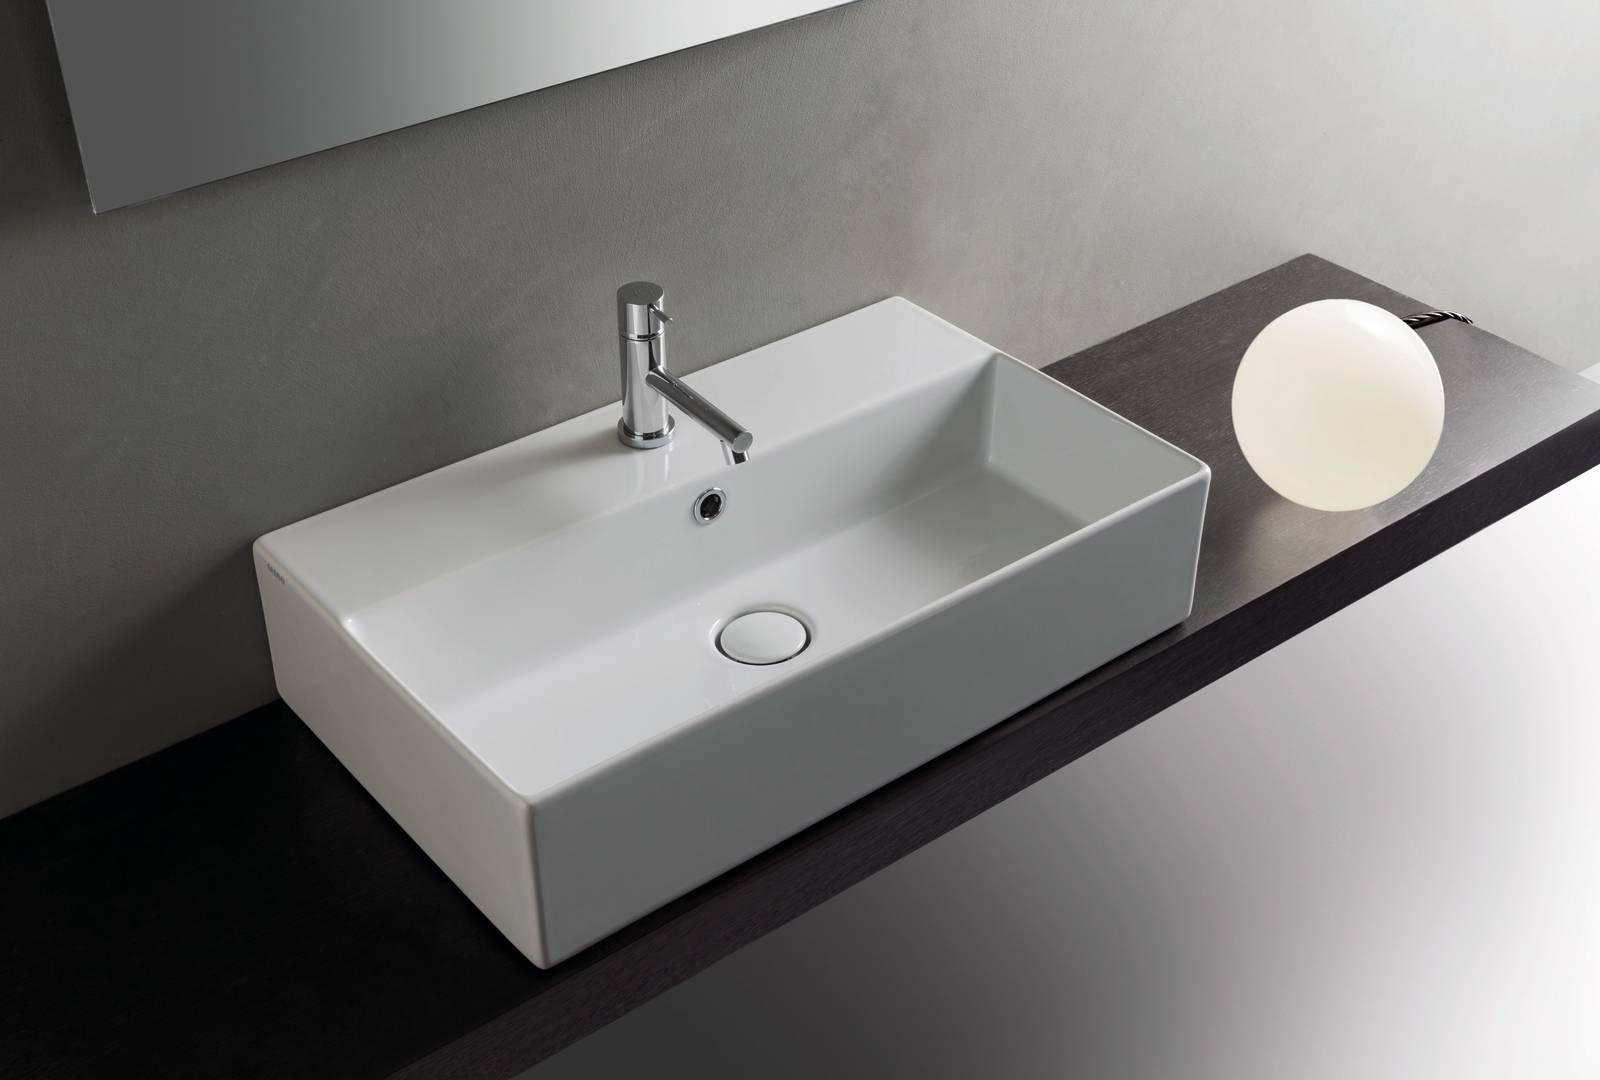 Vasca Da Bagno Globo : Le novità di olympia per il cersaie nuova vasca da bagno